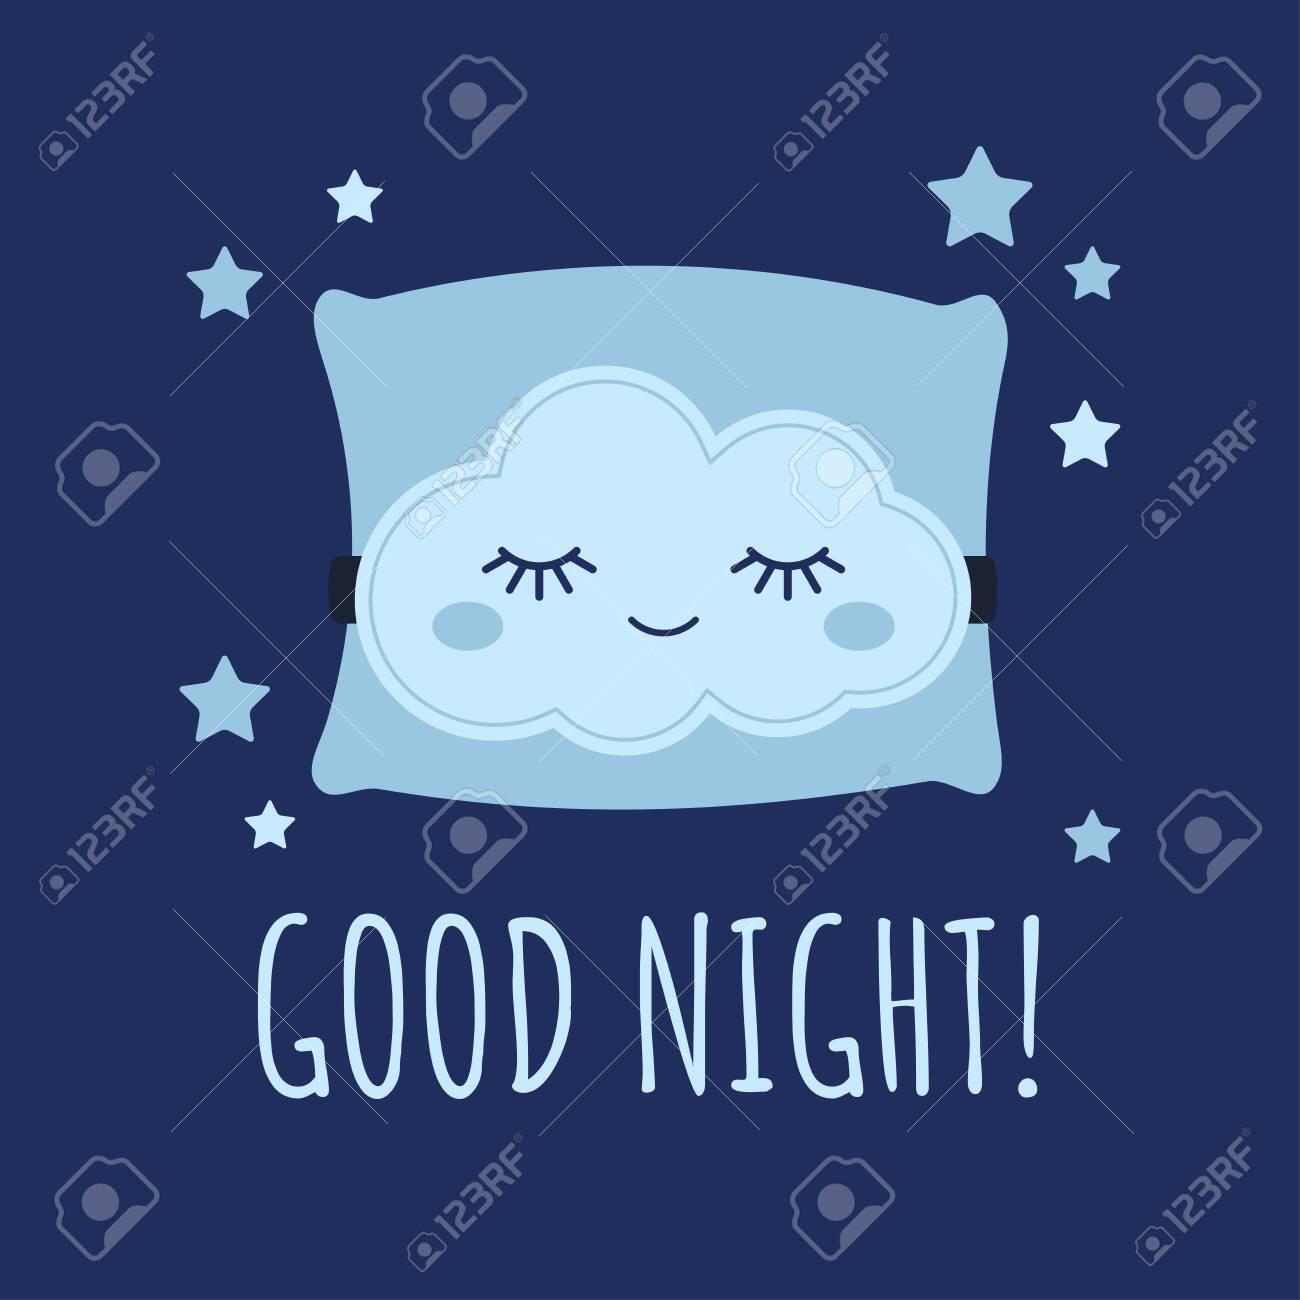 cute cloud sleep mask on pillow and stars around baby print